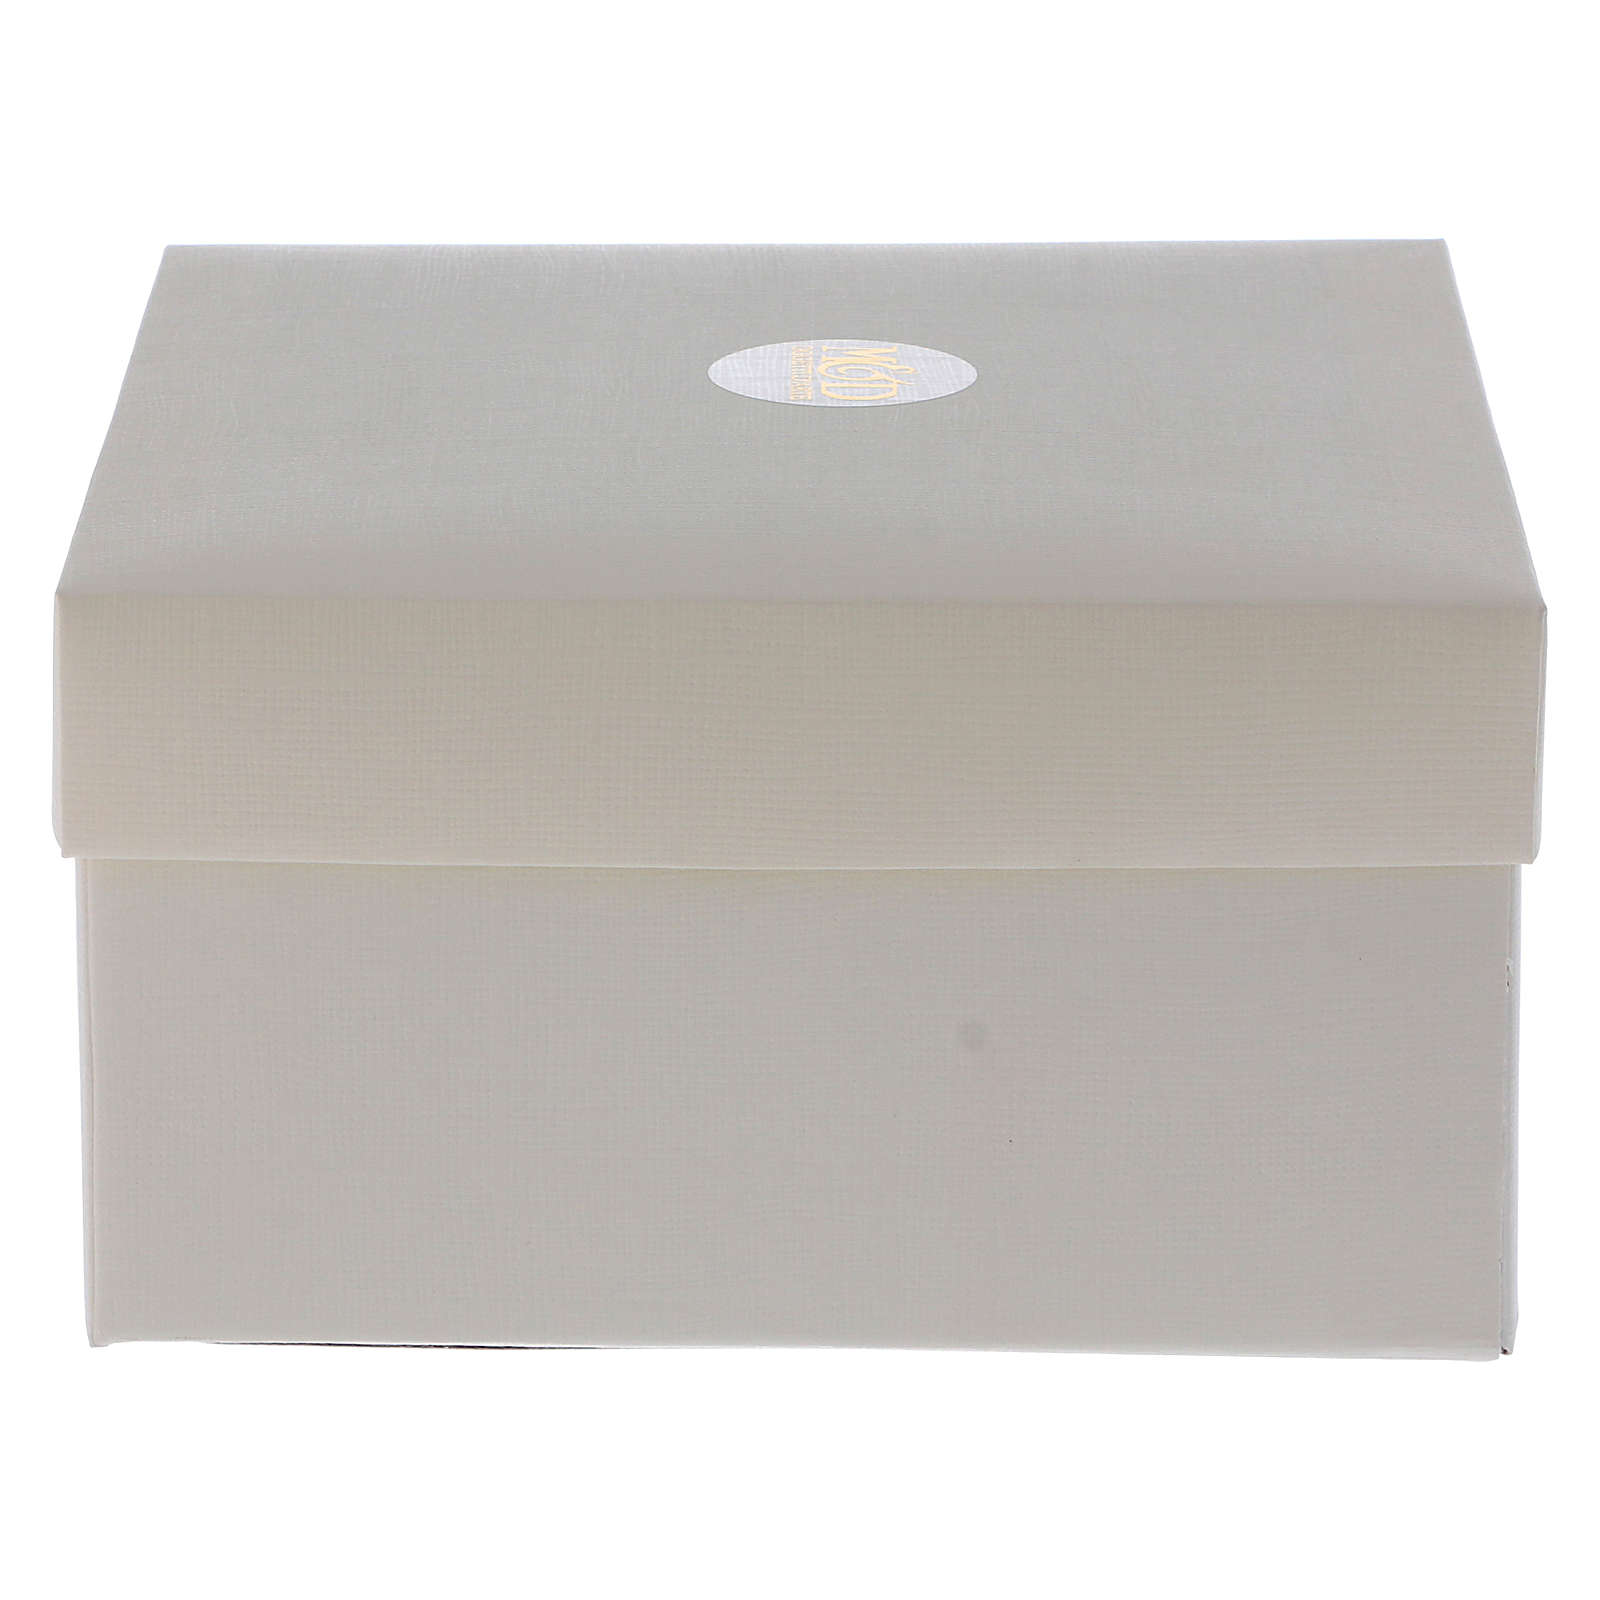 Bomboniera sacra fermacarte per il Battesimo 5x5x5 cm 3